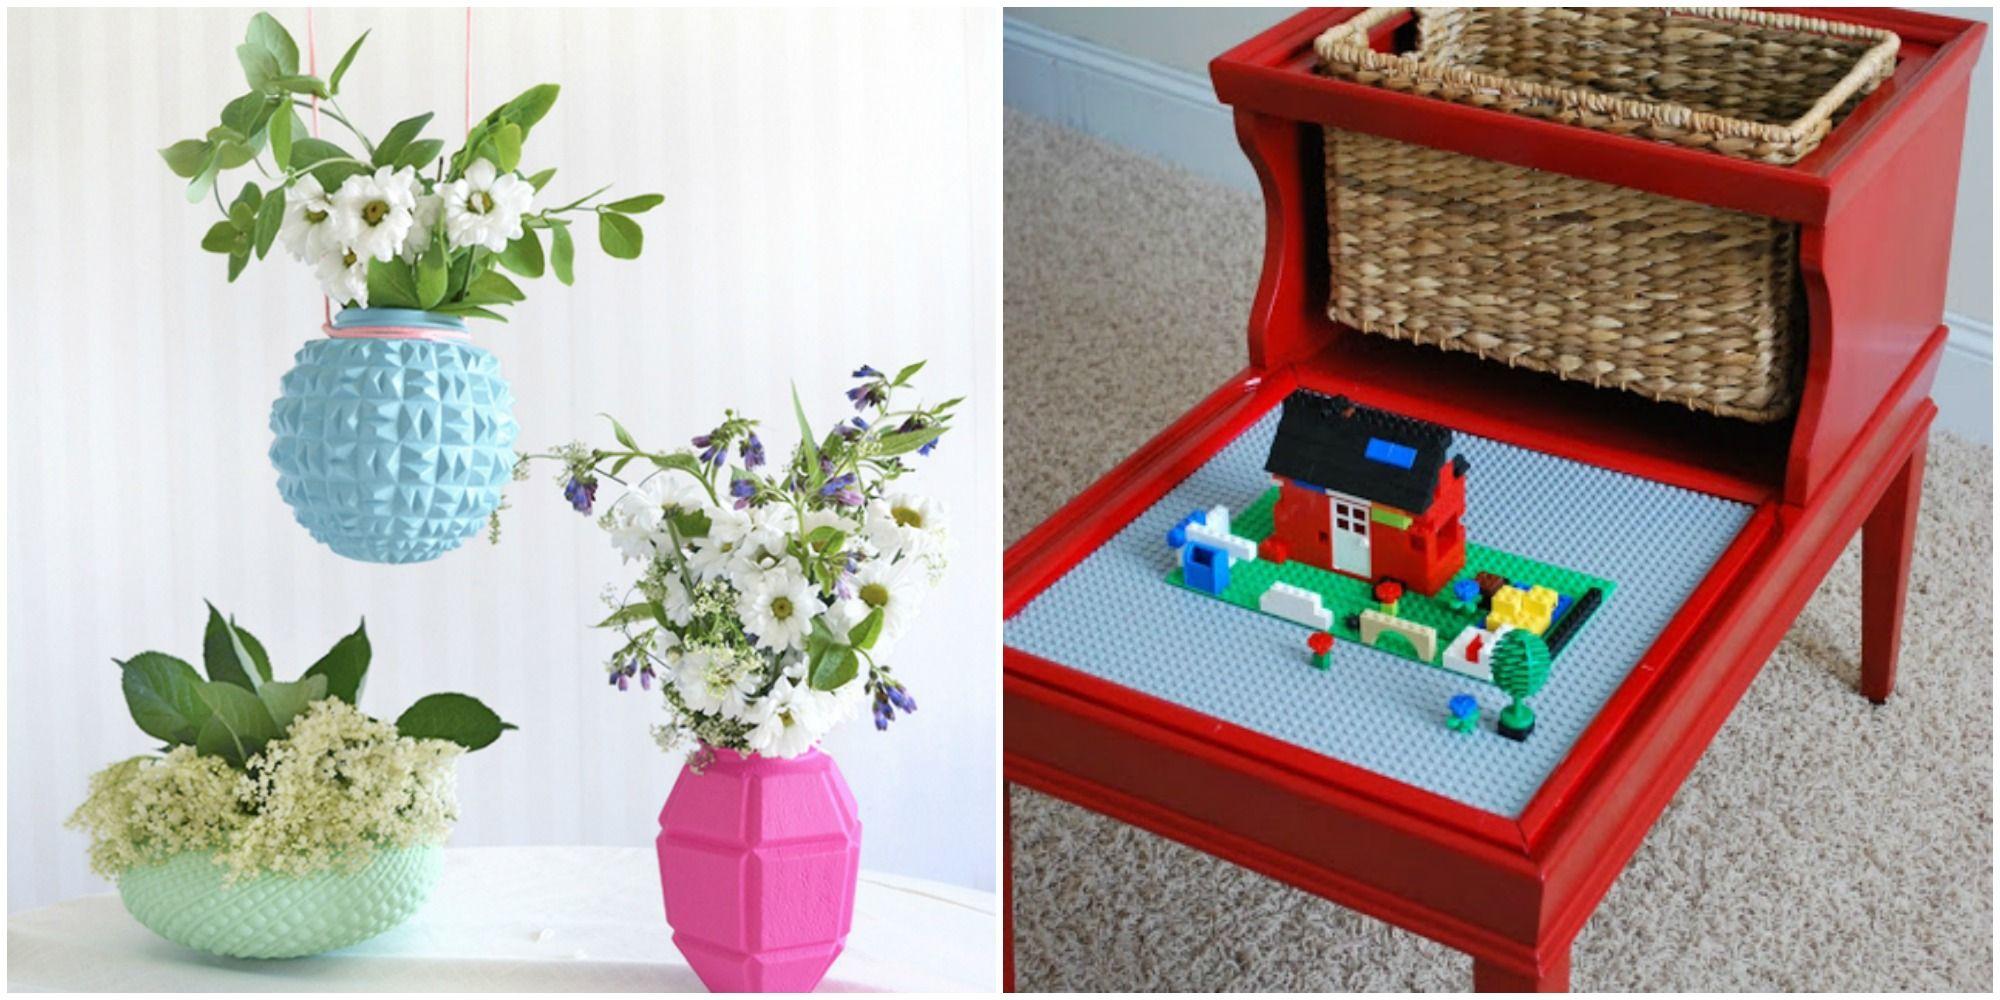 Wonderful Trash To Treasure Ideas Home Decor Part - 11: Good Housekeeping